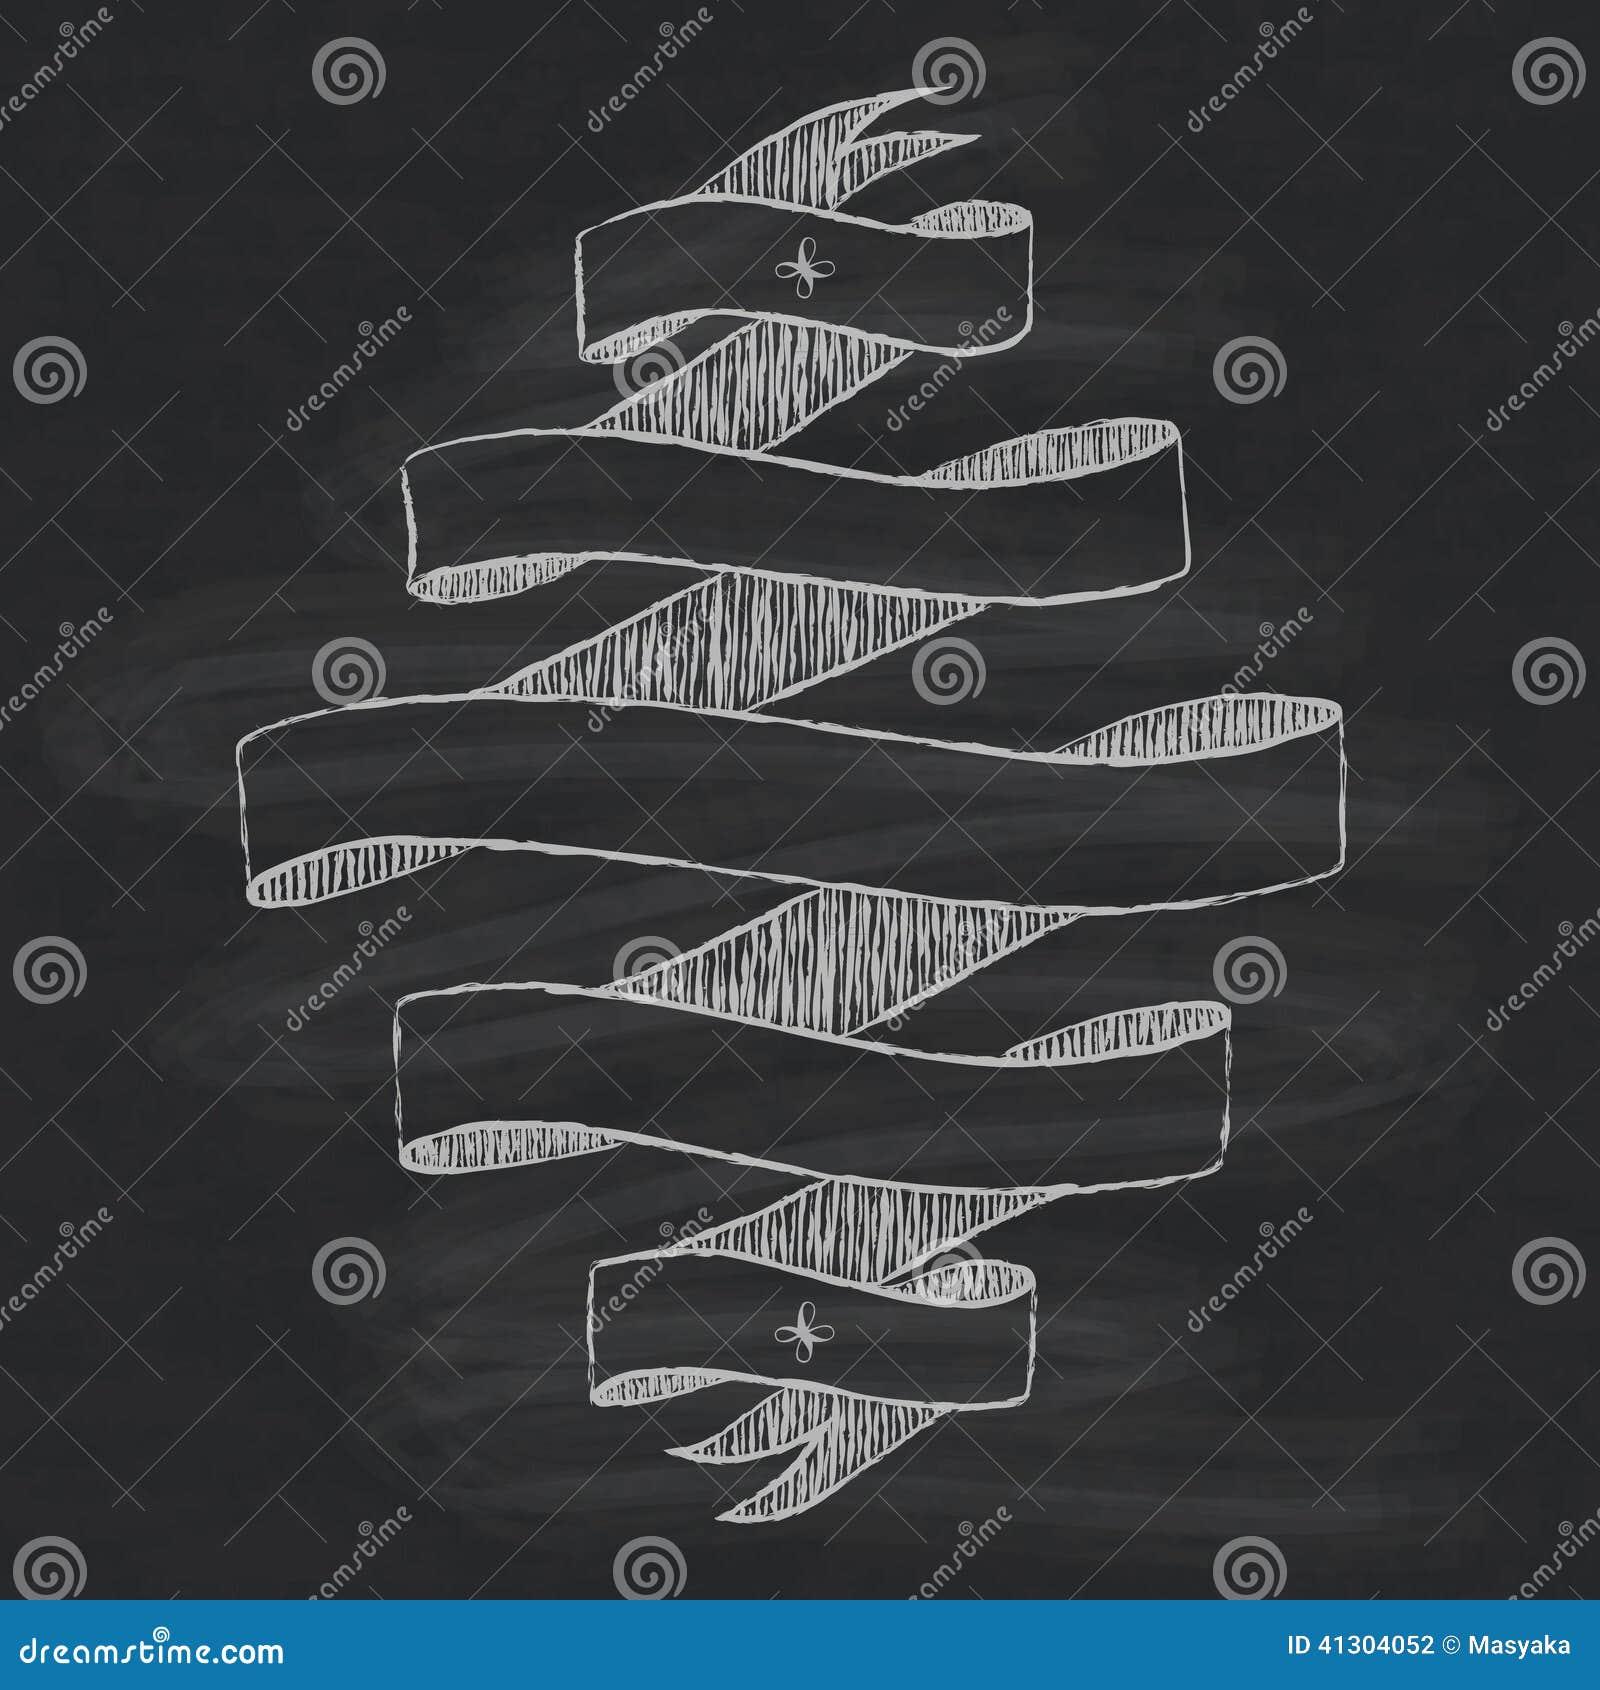 Chalkboard Design Element Stock Vector Illustration Of Ornate